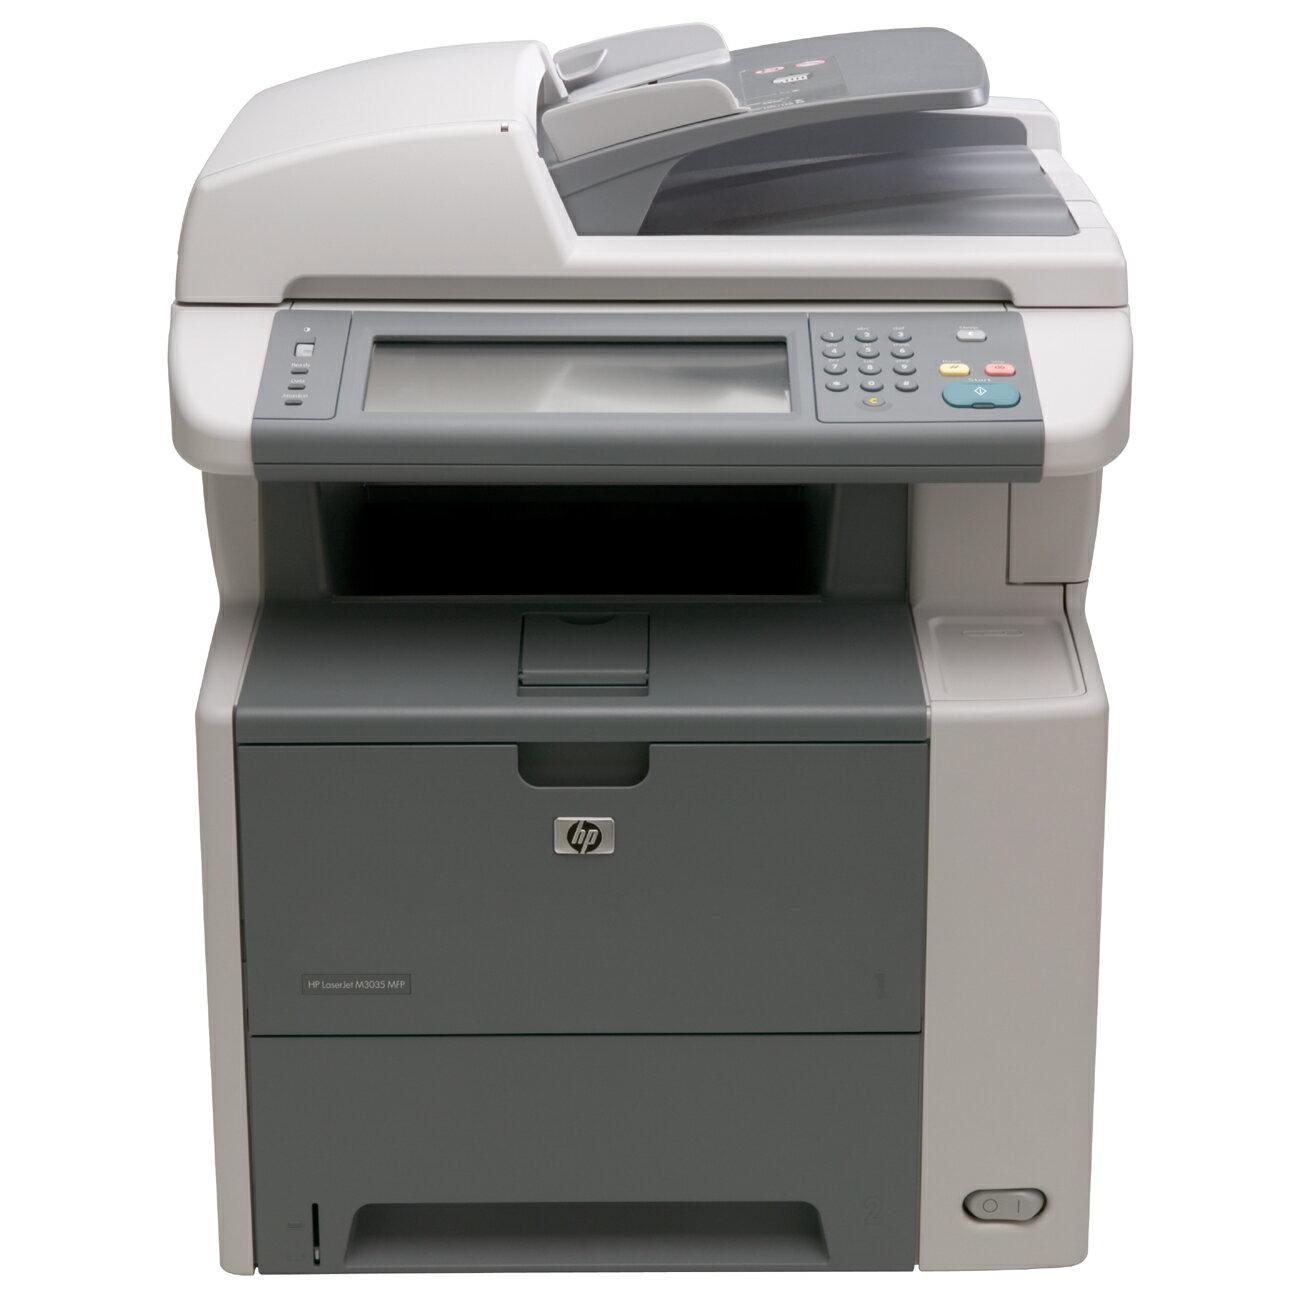 HP LaserJet M3035 Monochrome Multifunction Laser Printer 0